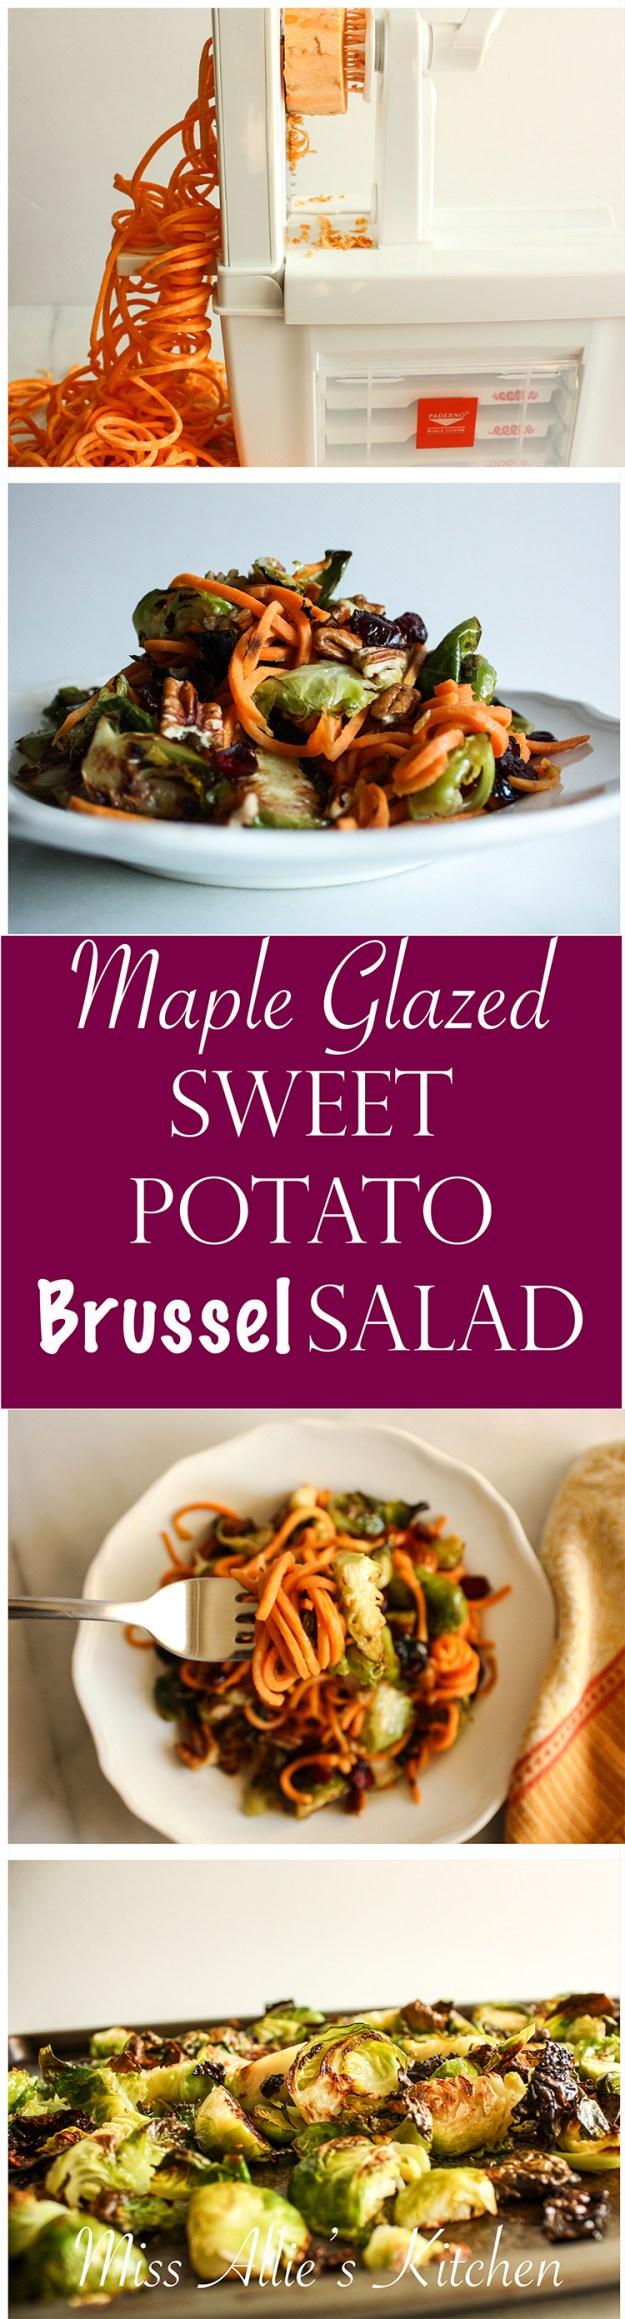 maple-glazed-sweet-potato-brussel-salad